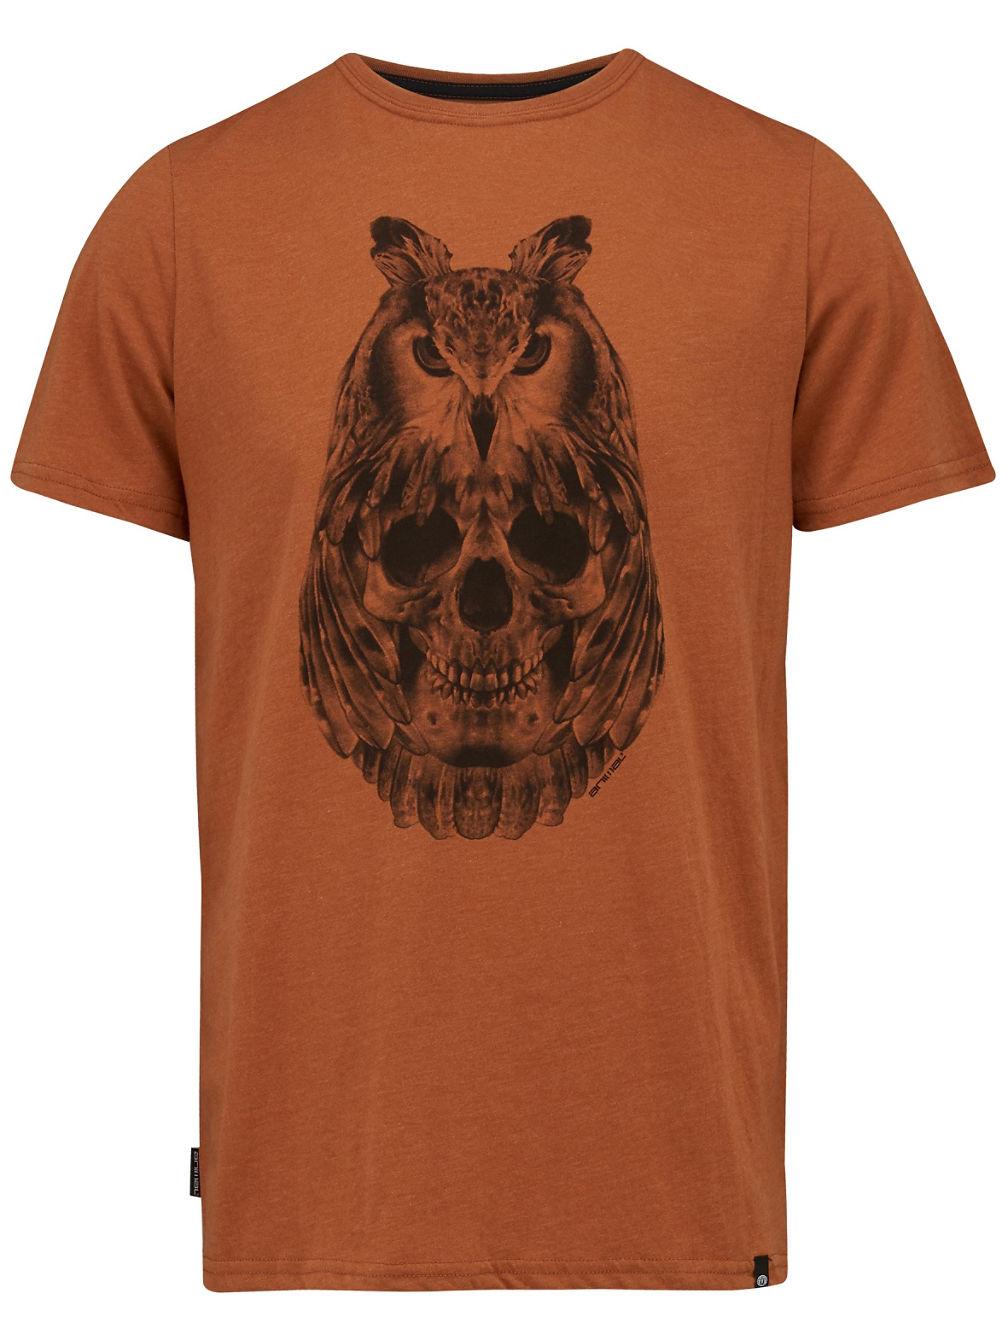 animal-owly-t-shirt